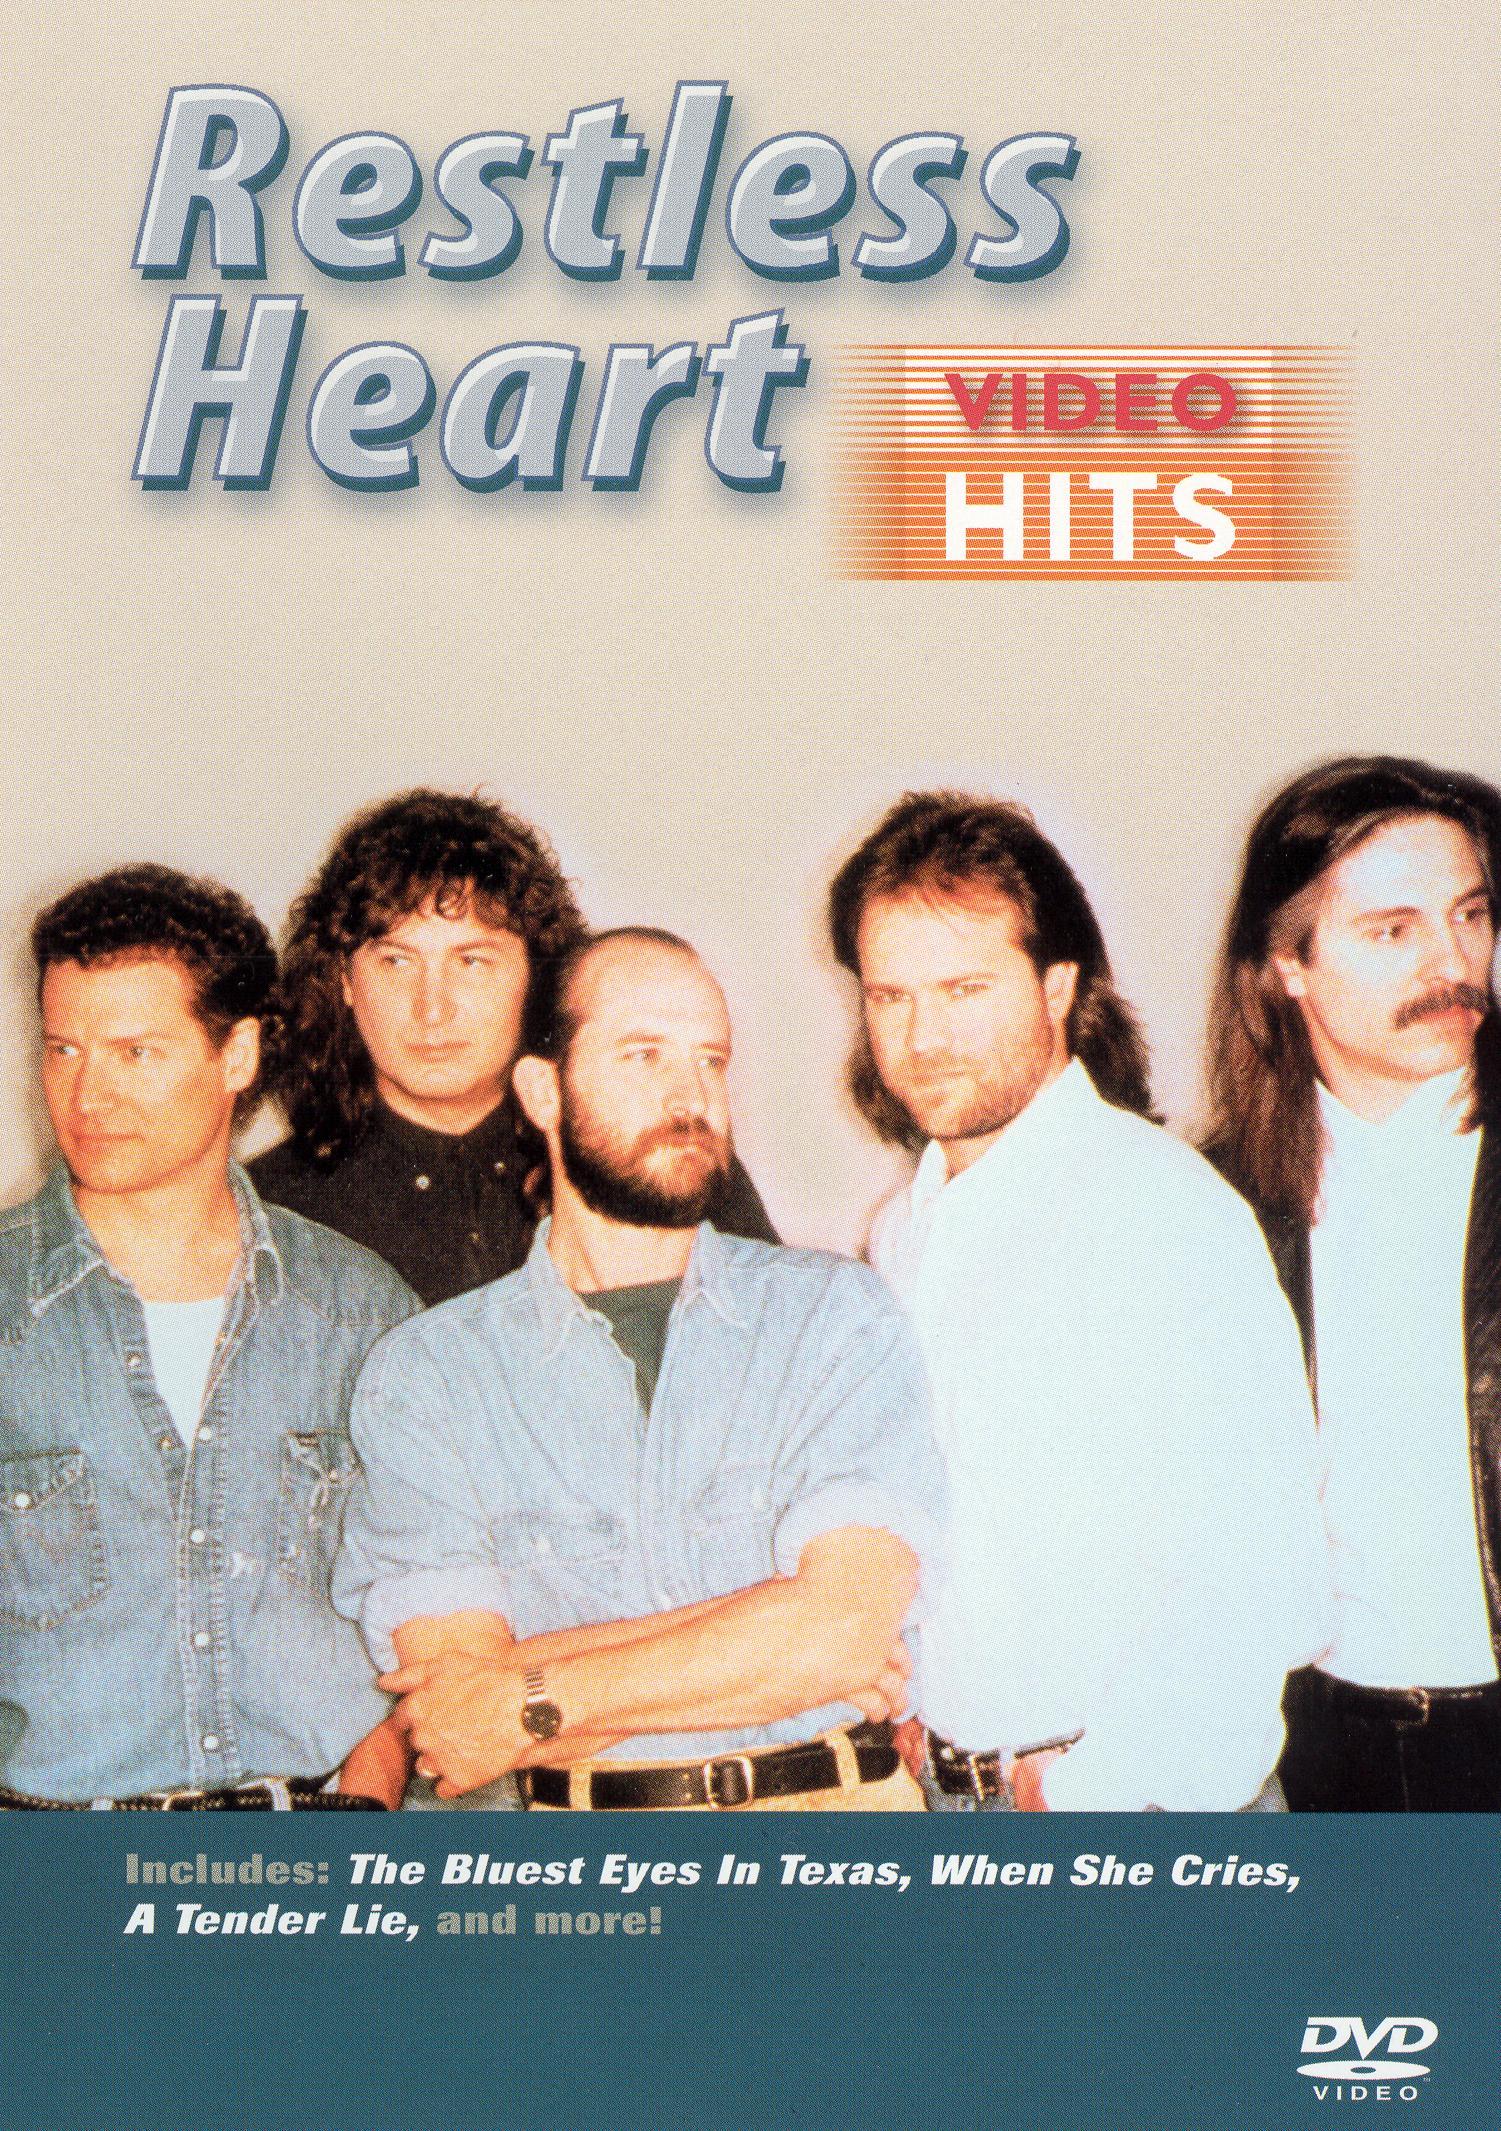 Restless Heart: Video Hits